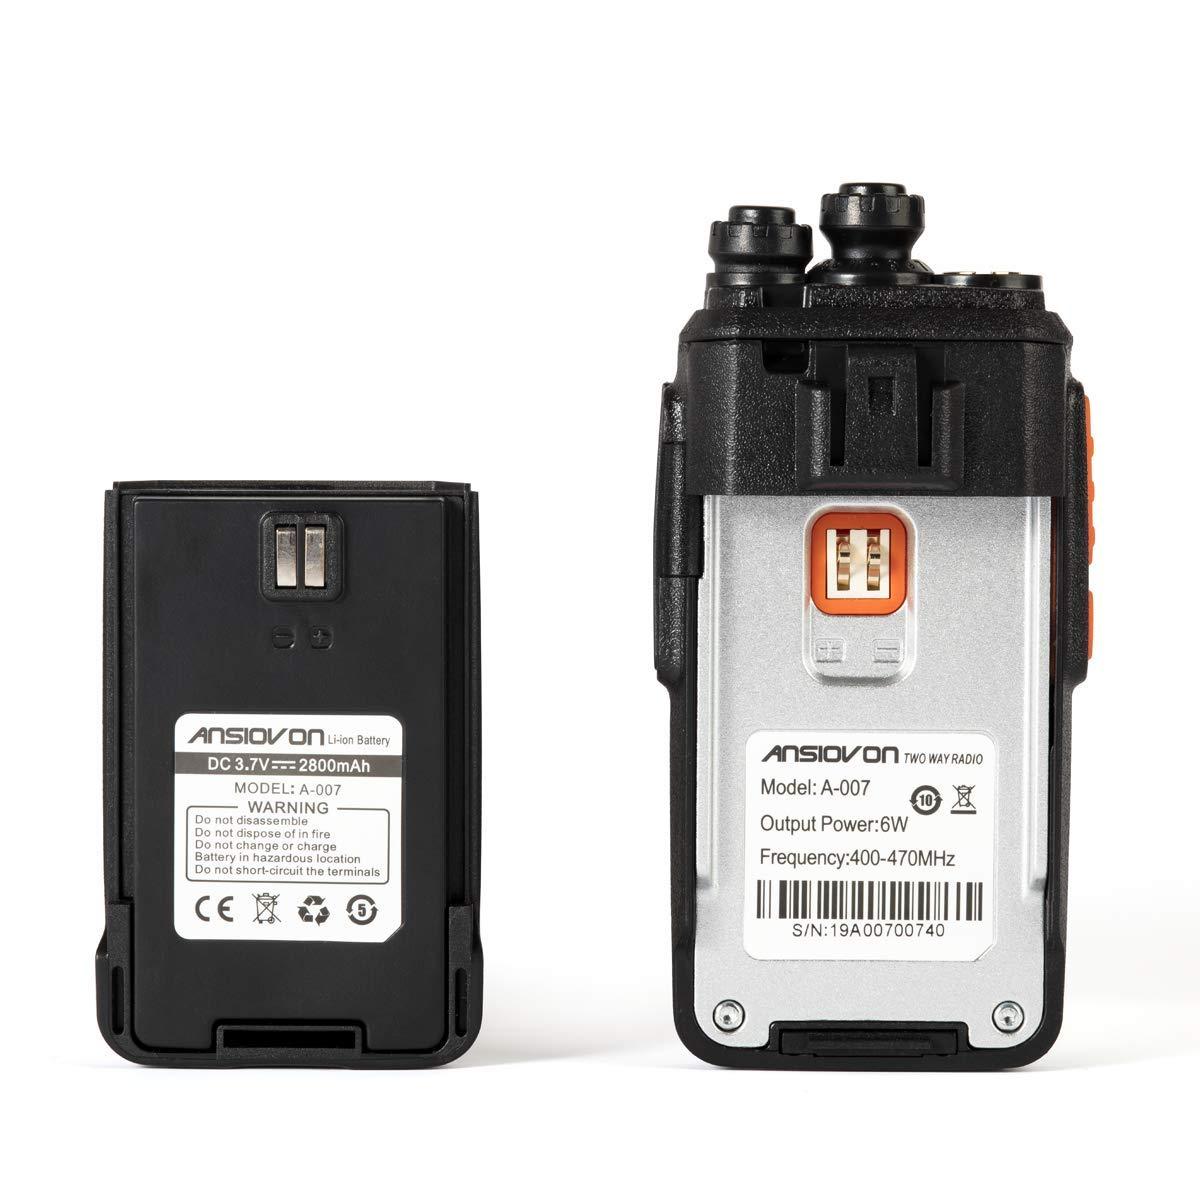 SL 7000e 7550e 7580e 7590e 7550 7580 7590 D-Shape Earpiece with in-Line Mic//PTT for Motorola Radios TLK 100 SL300 SL3500e SL7550e SL7580e SL7590e SL7550 SL7580 SL7590 Headset w//Reinforced Cable